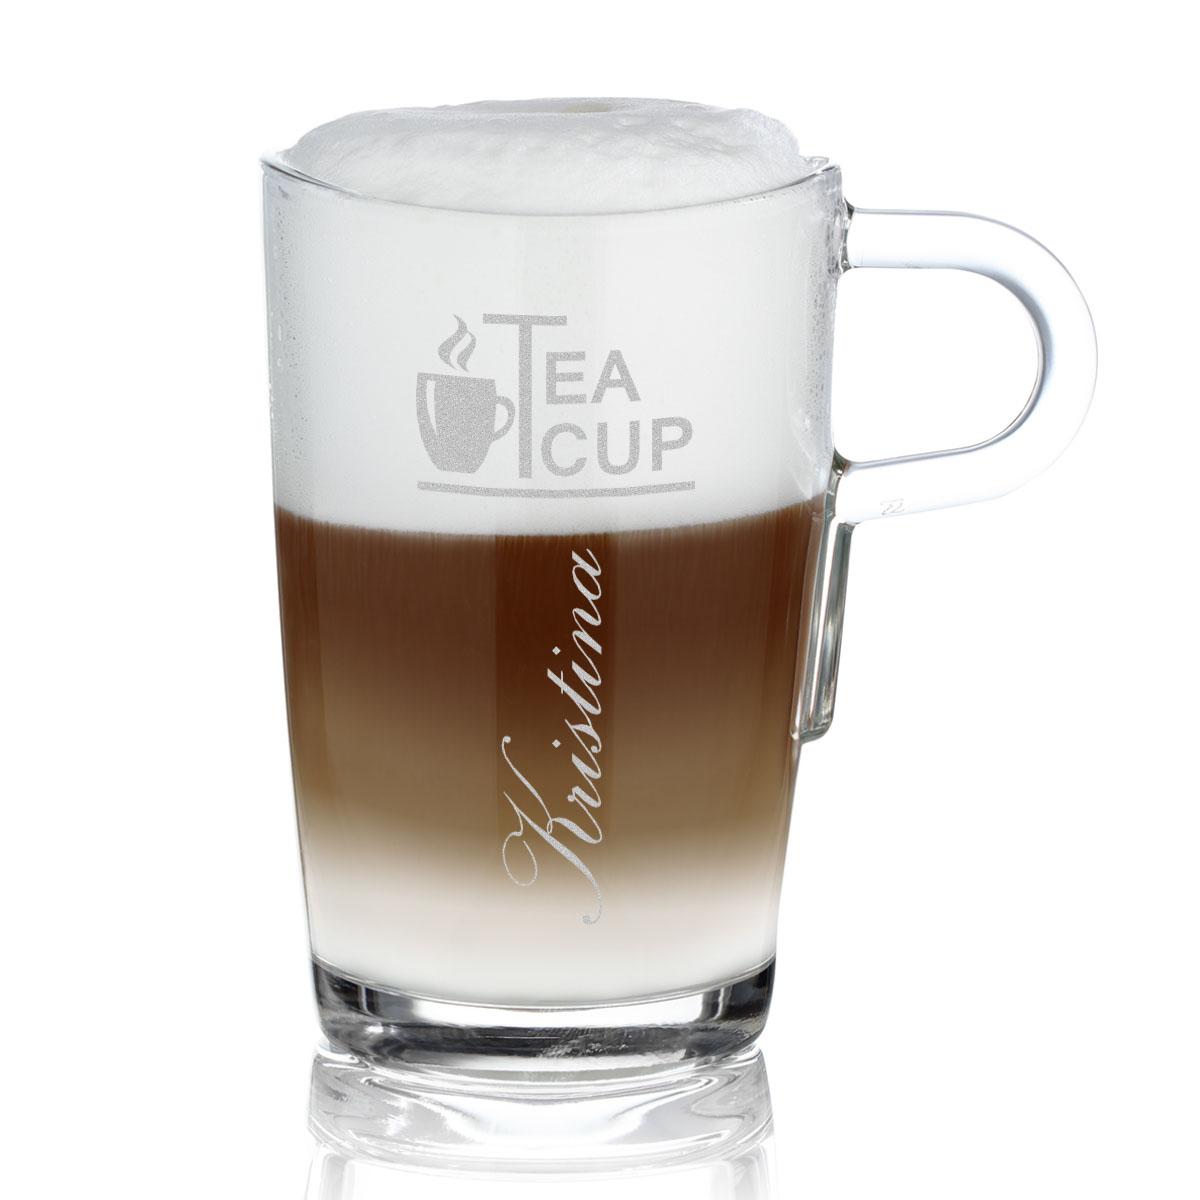 leonardo kaffee latte macchiato becher loop mit gratis wunschgravur ebay. Black Bedroom Furniture Sets. Home Design Ideas